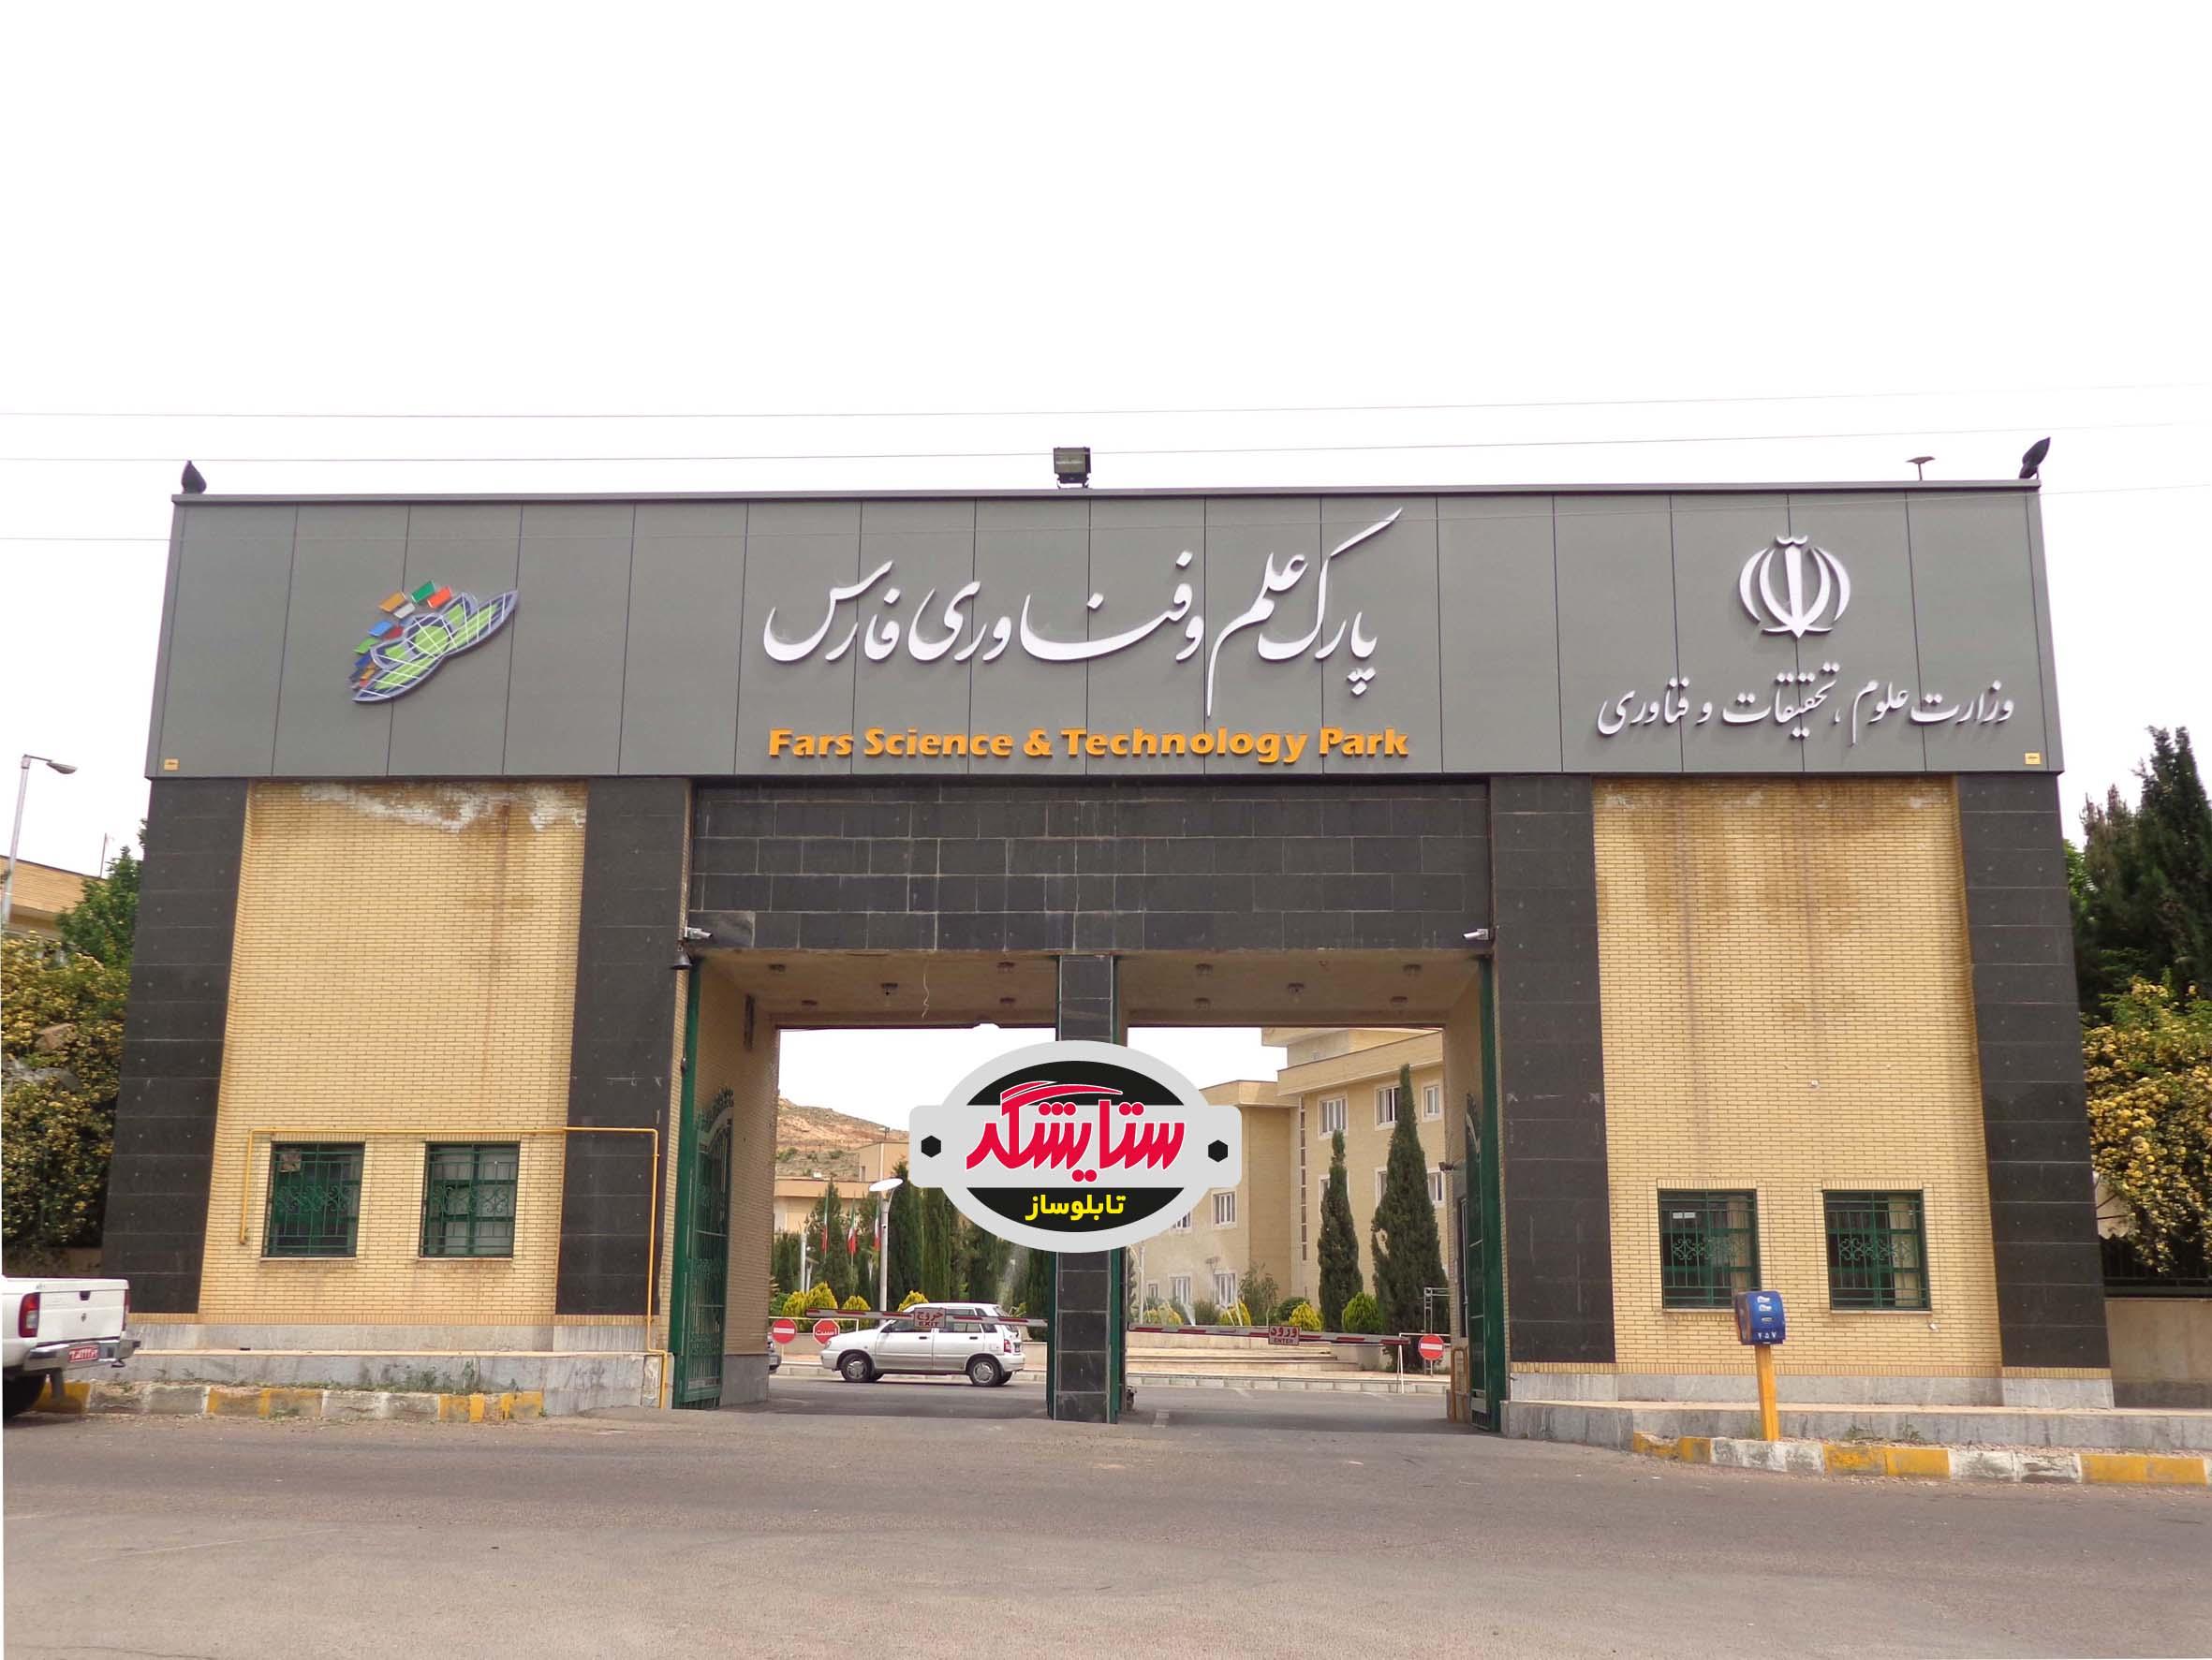 اجرای آلومینیوم کامپوزیت و حروف چنلیوم سردرب پارک علم و فناوری فارس